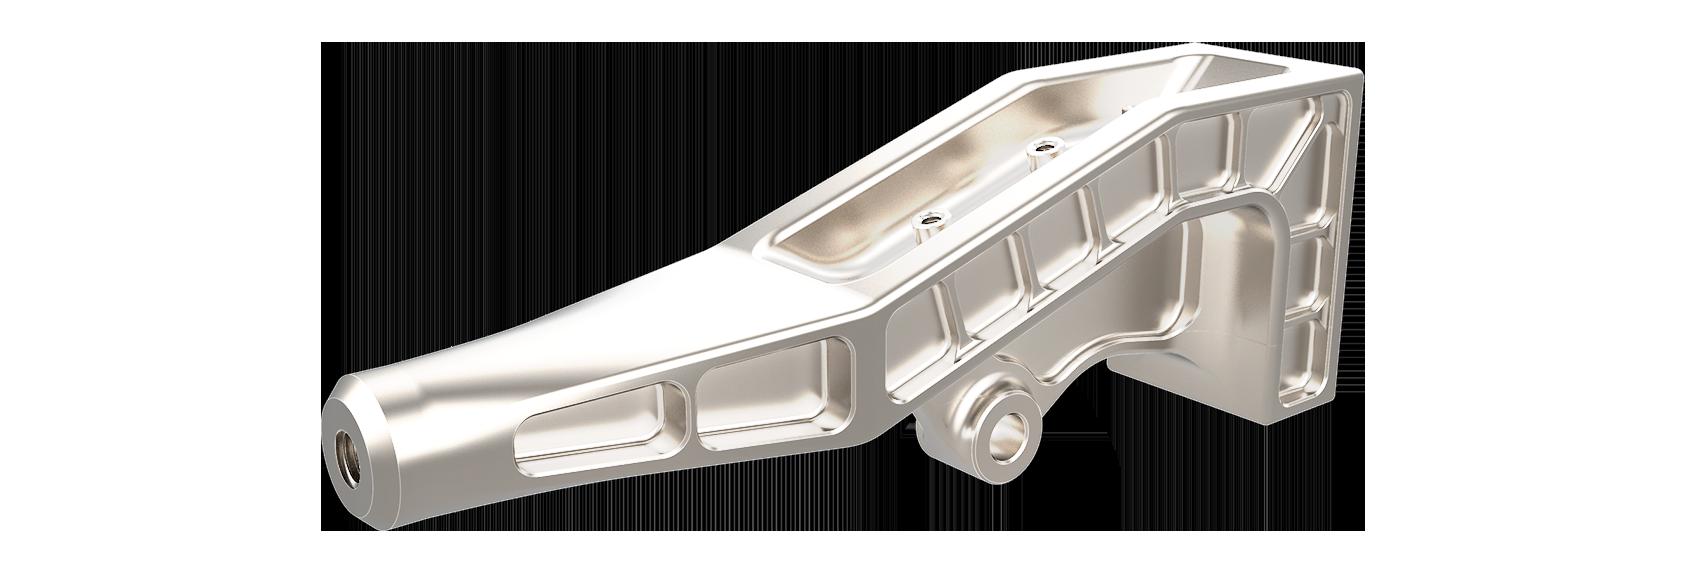 TITAN-503